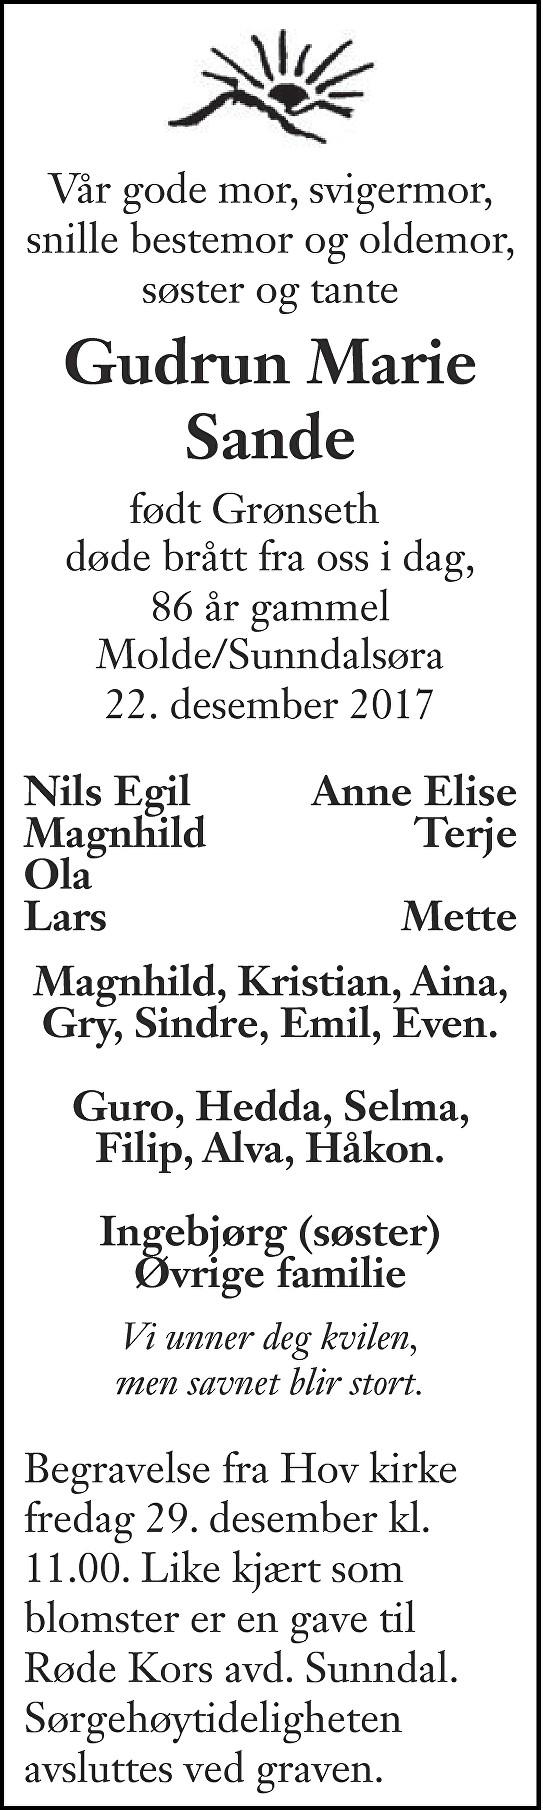 Gudrun Marie Sande Dødsannonse